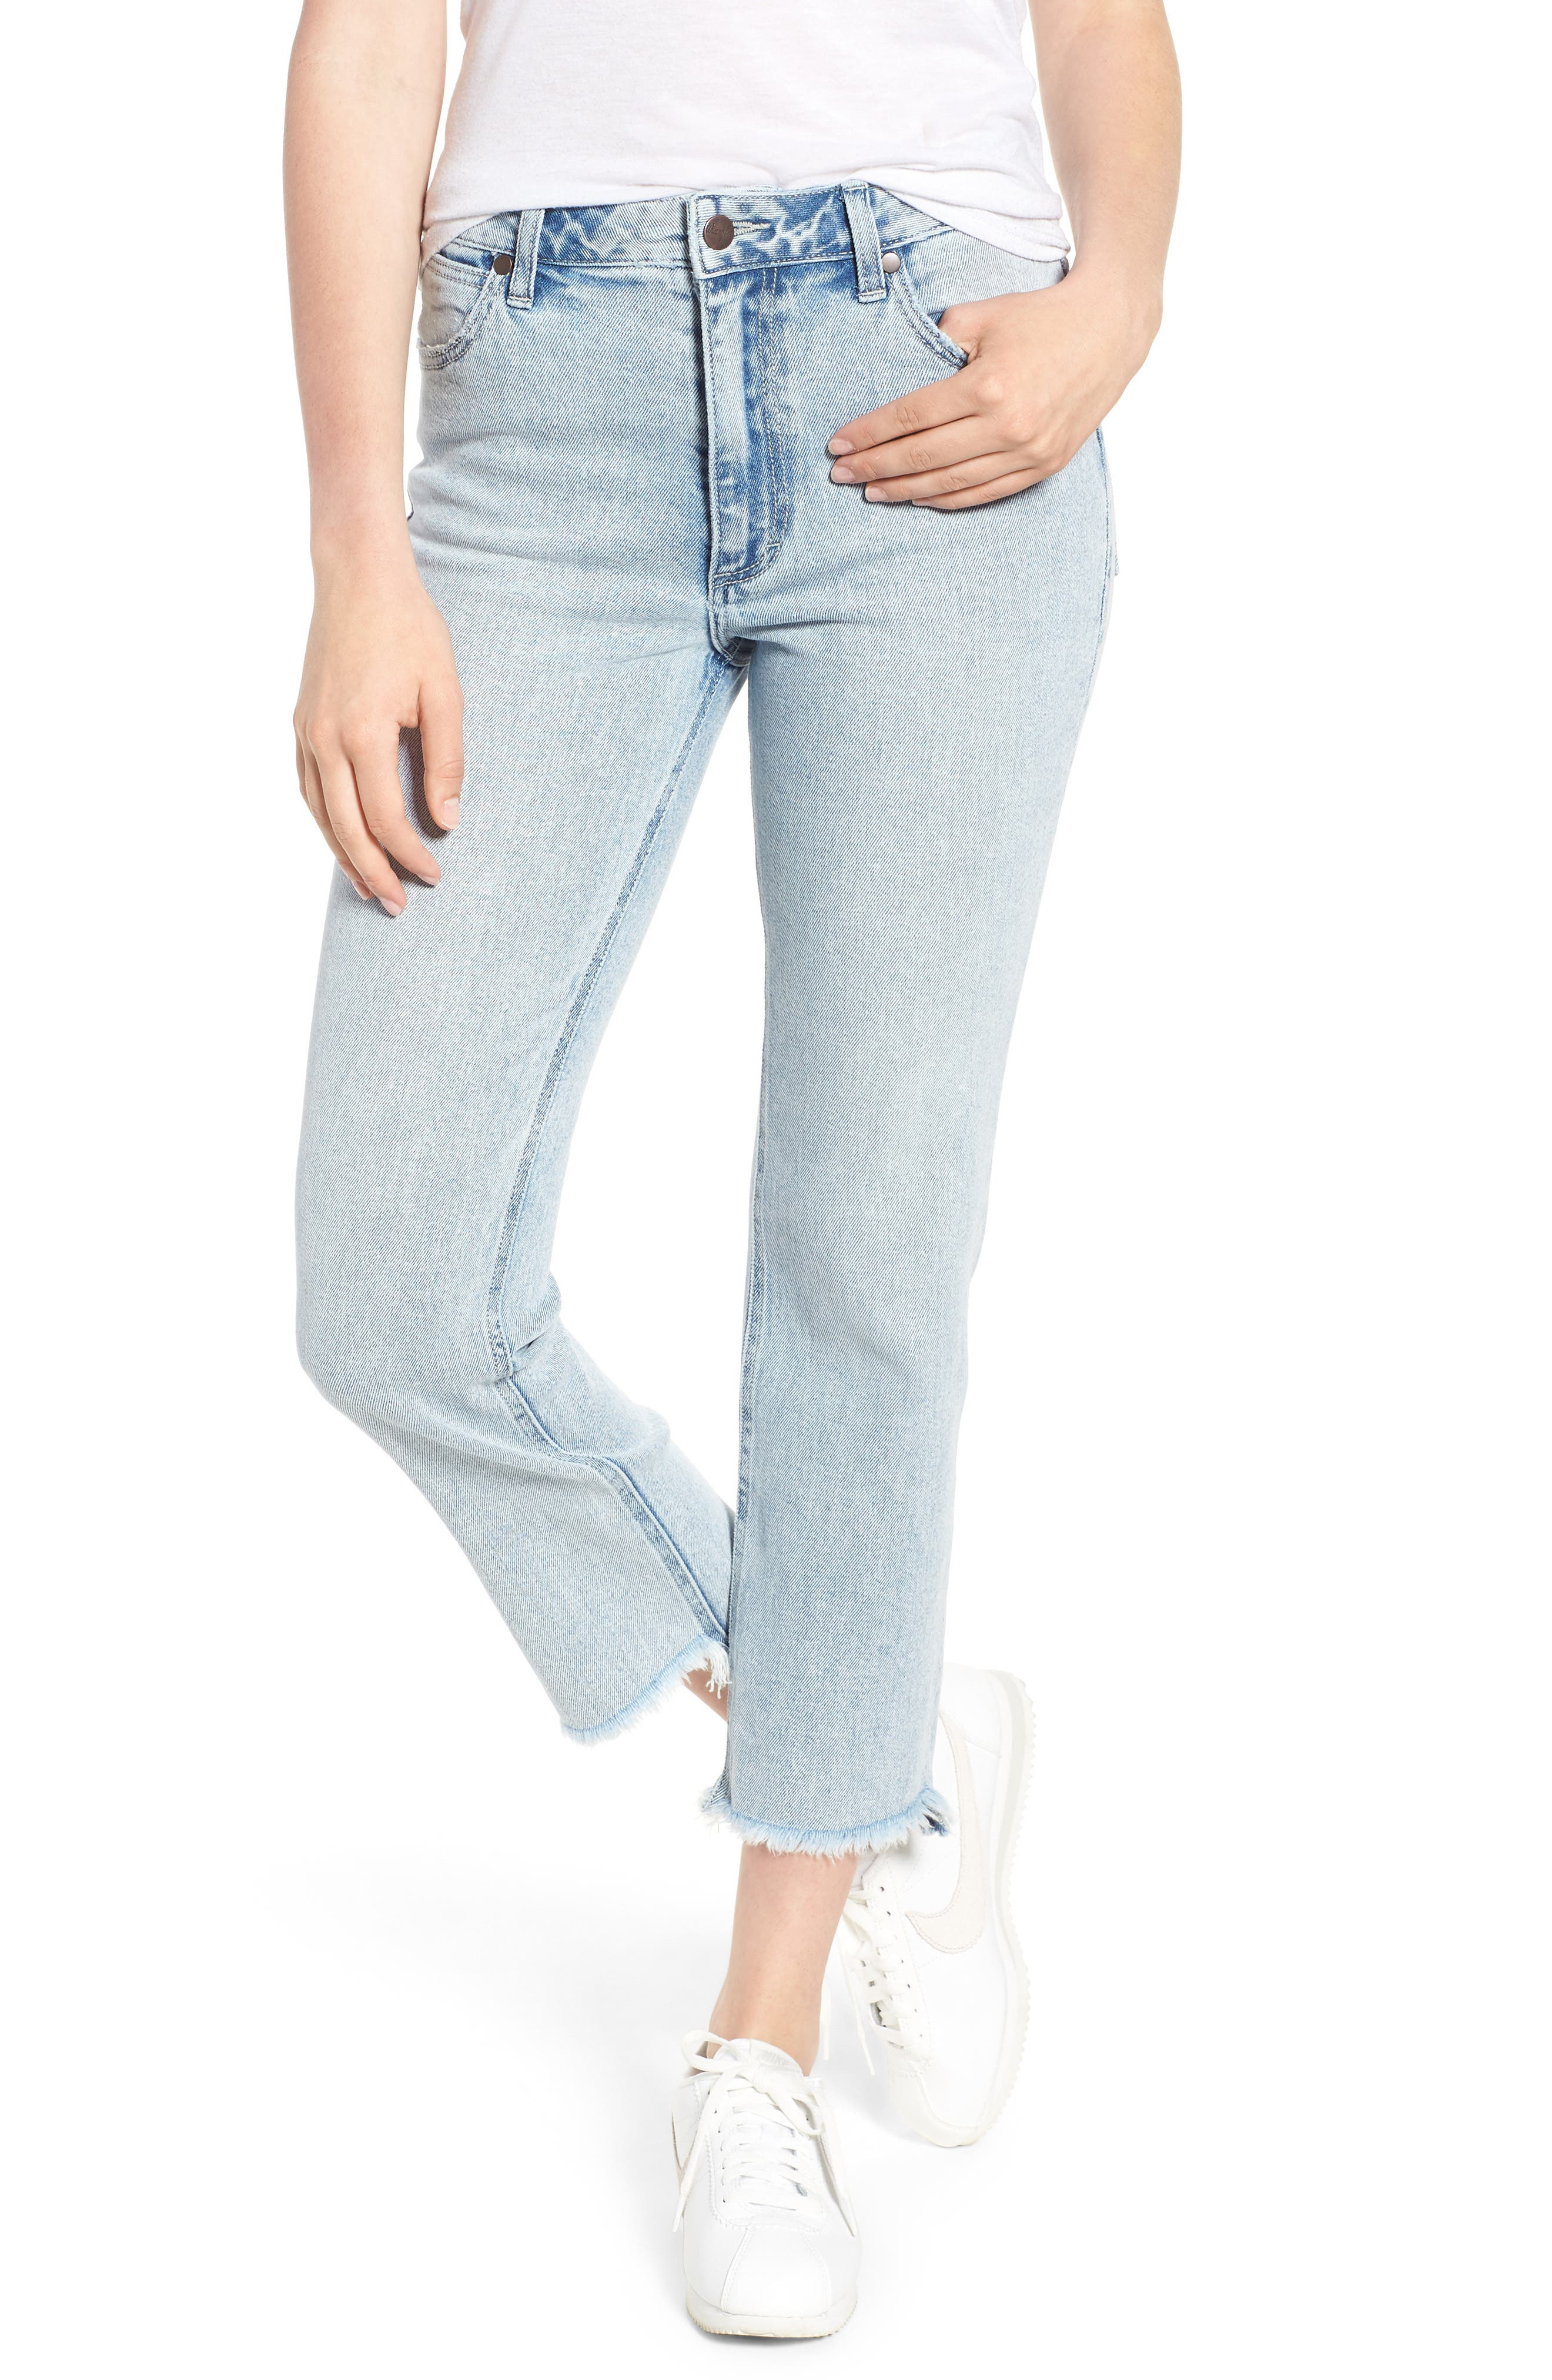 WRANGLER Acid Wash High Waist Crop Jeans, Main, color, 454